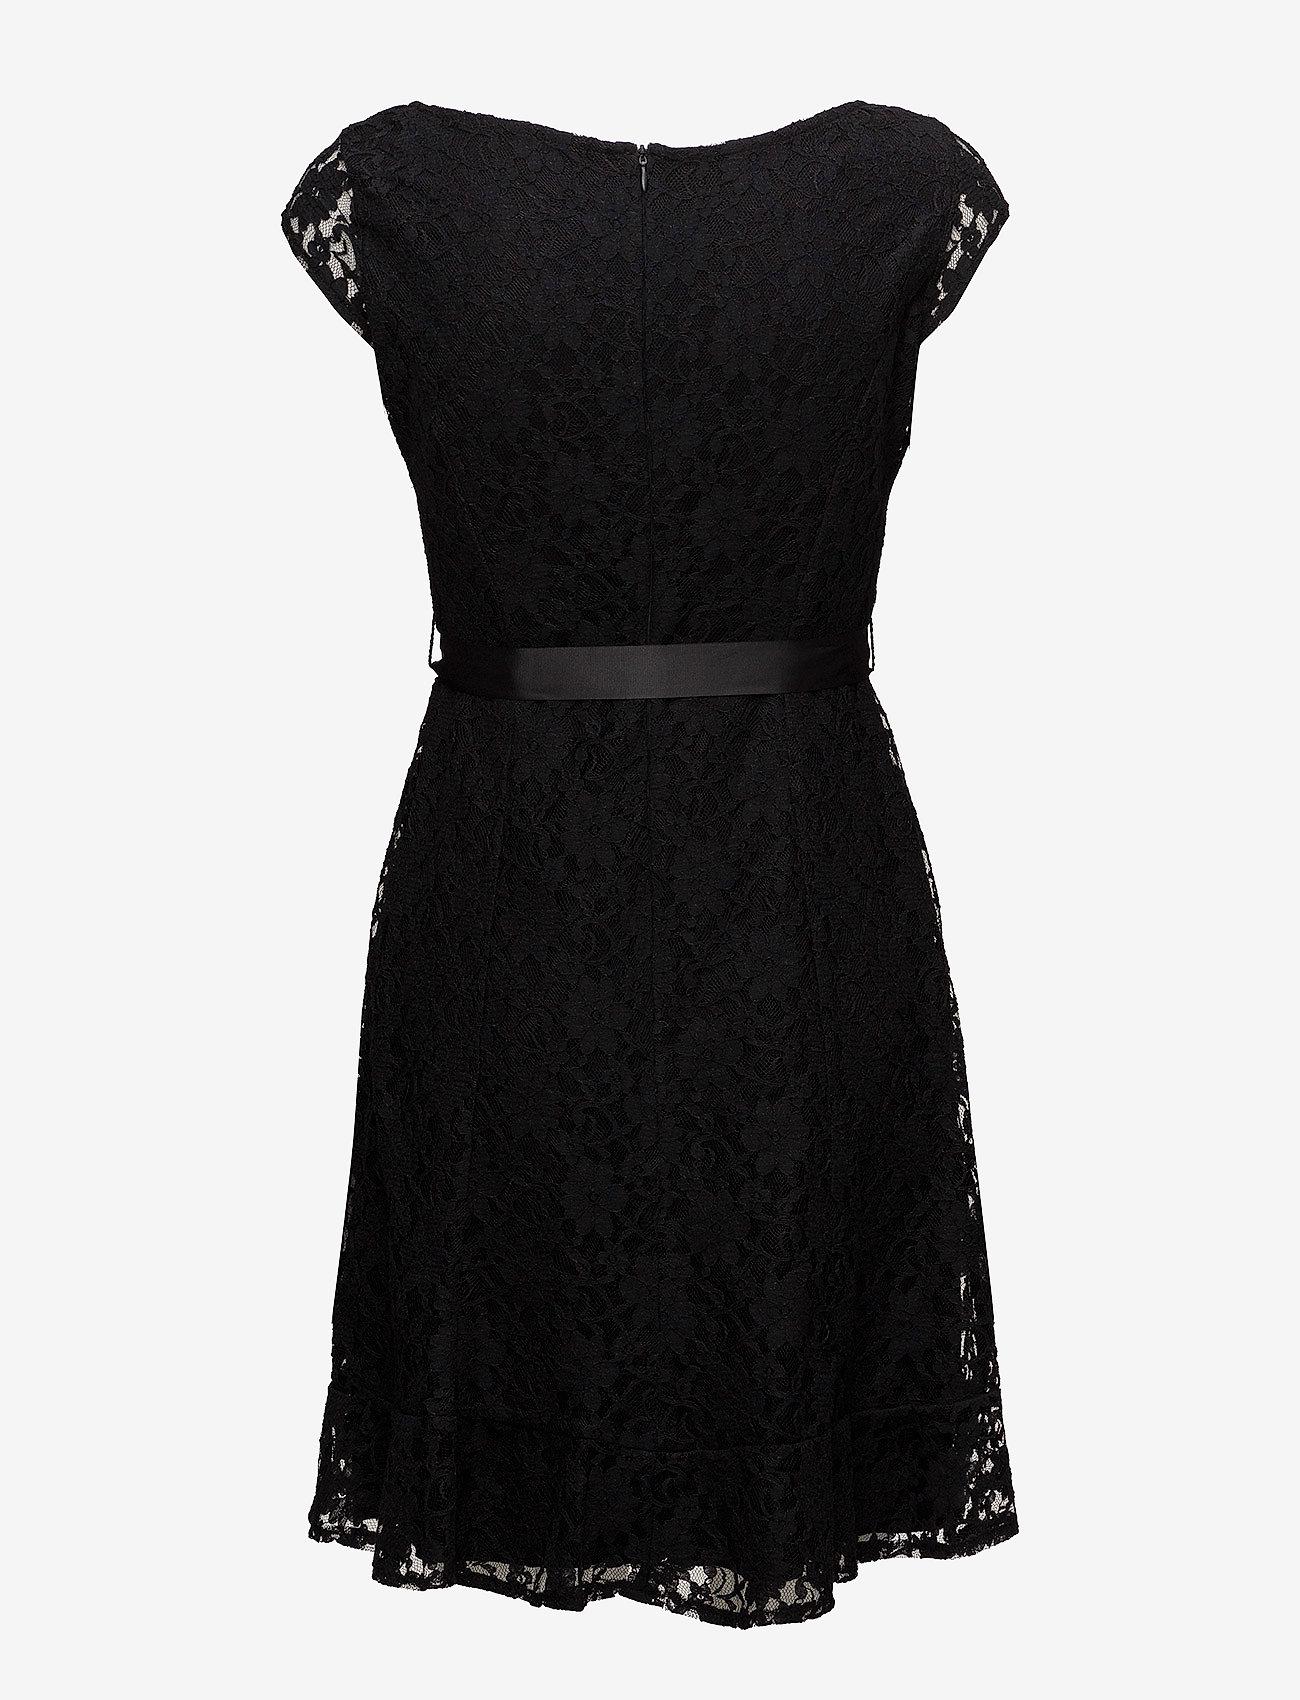 Taifun - DRESS WOVEN FABRIC - midimekot - black